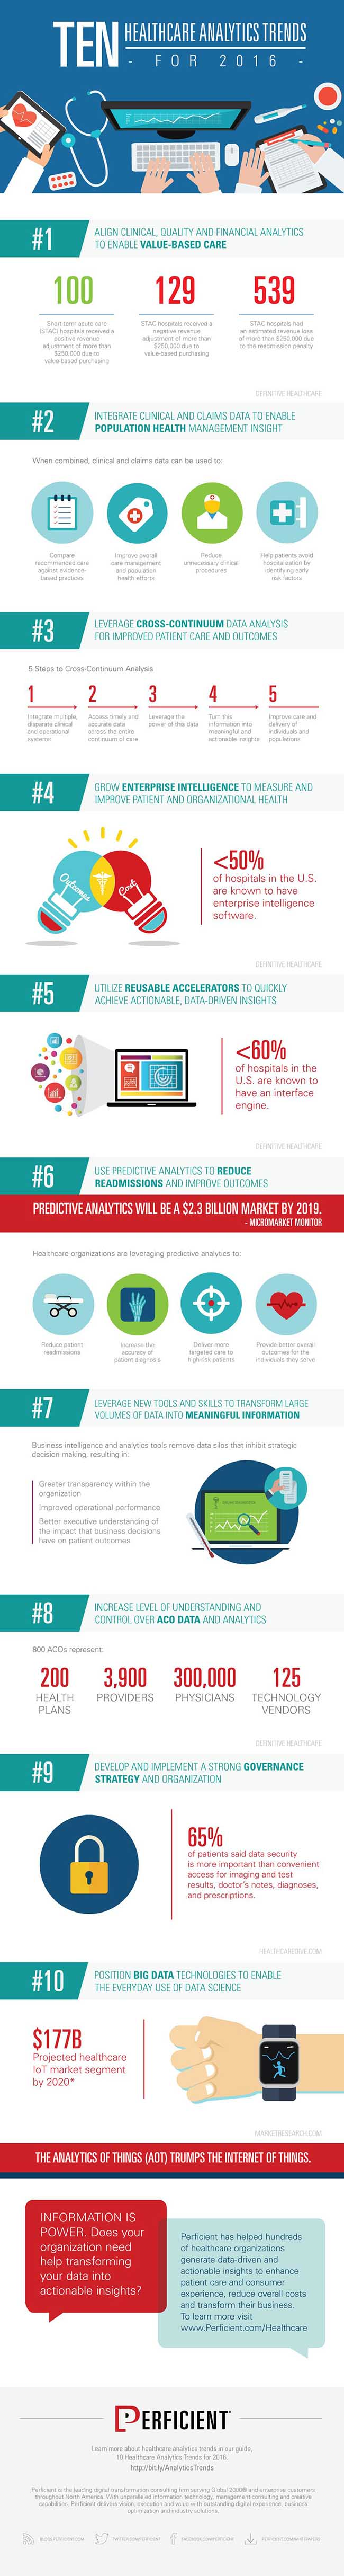 healthcare_analytics_infographic_for_hospital_wireless_networks.jpg